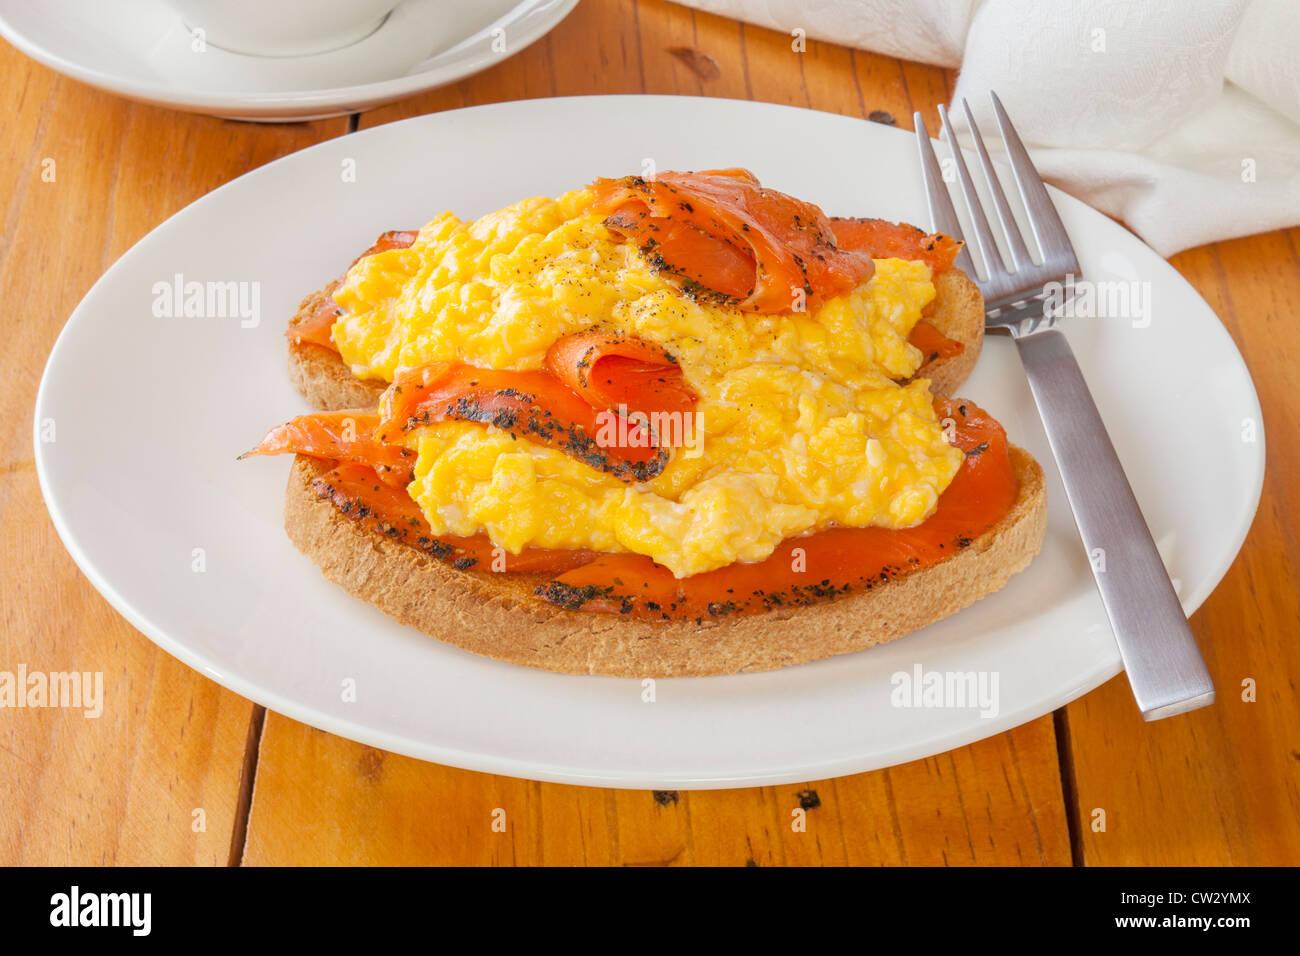 Seasoned smoked salmon with scrambled egg on toast. - Stock Image